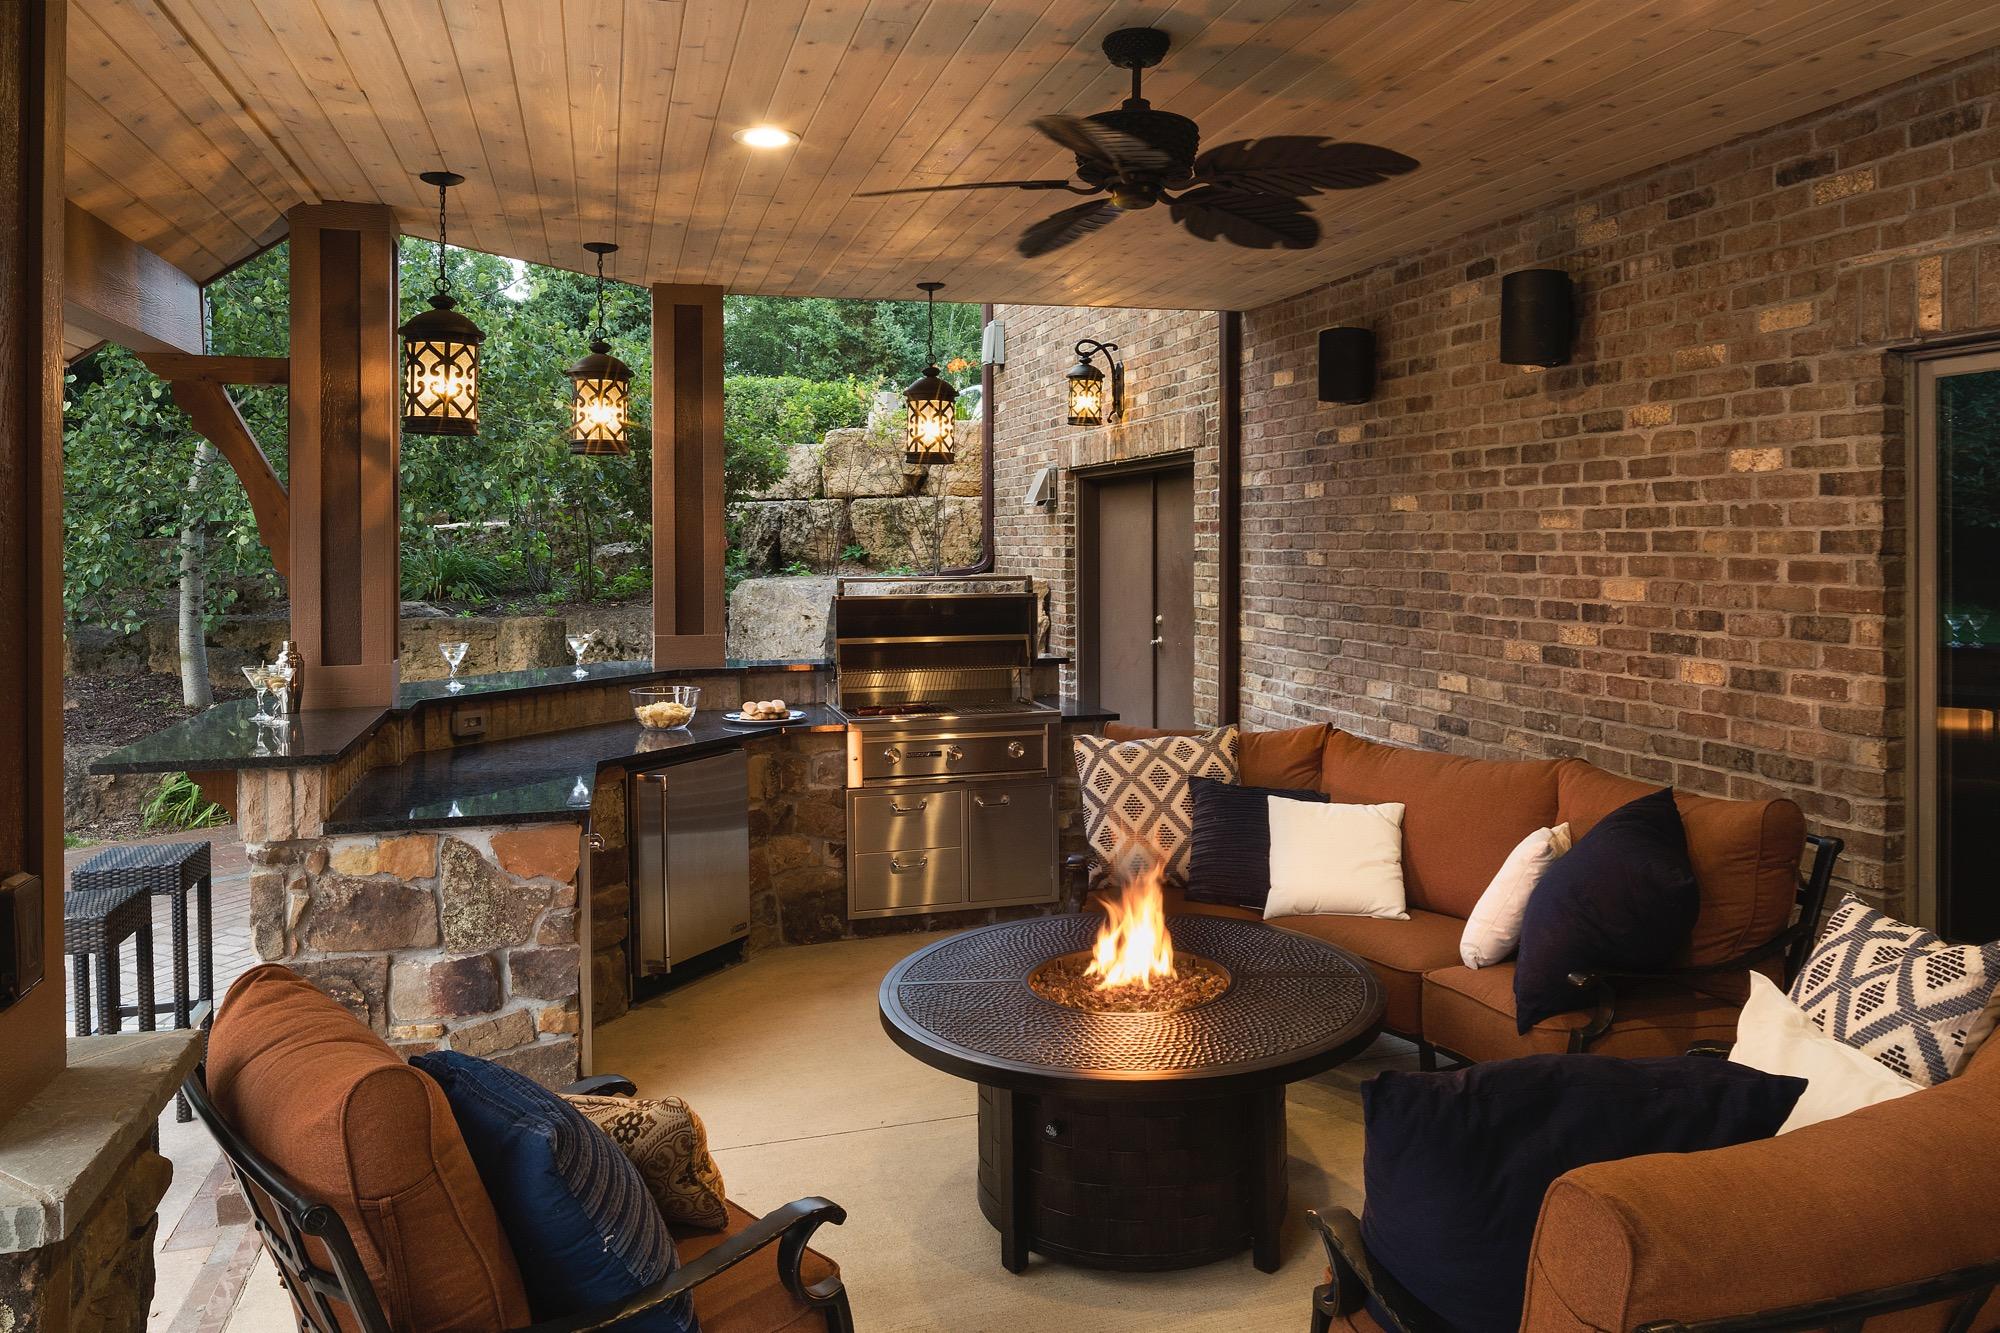 Moms Design Build - Natural Gas Fireplace Fire Bowl